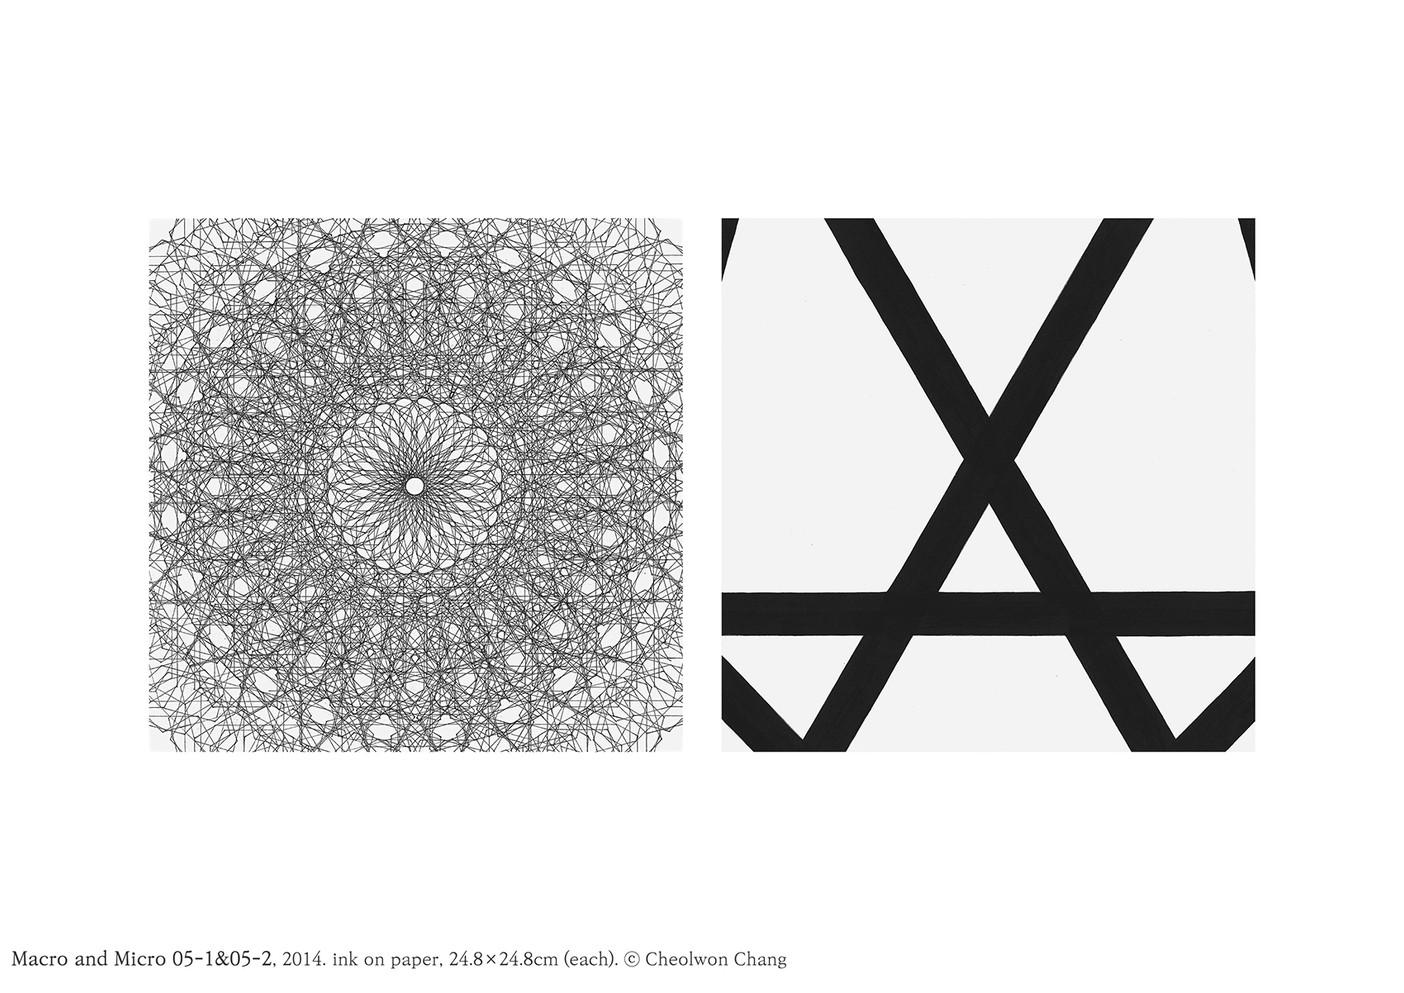 pattern_cheolwon chang (10).jpg